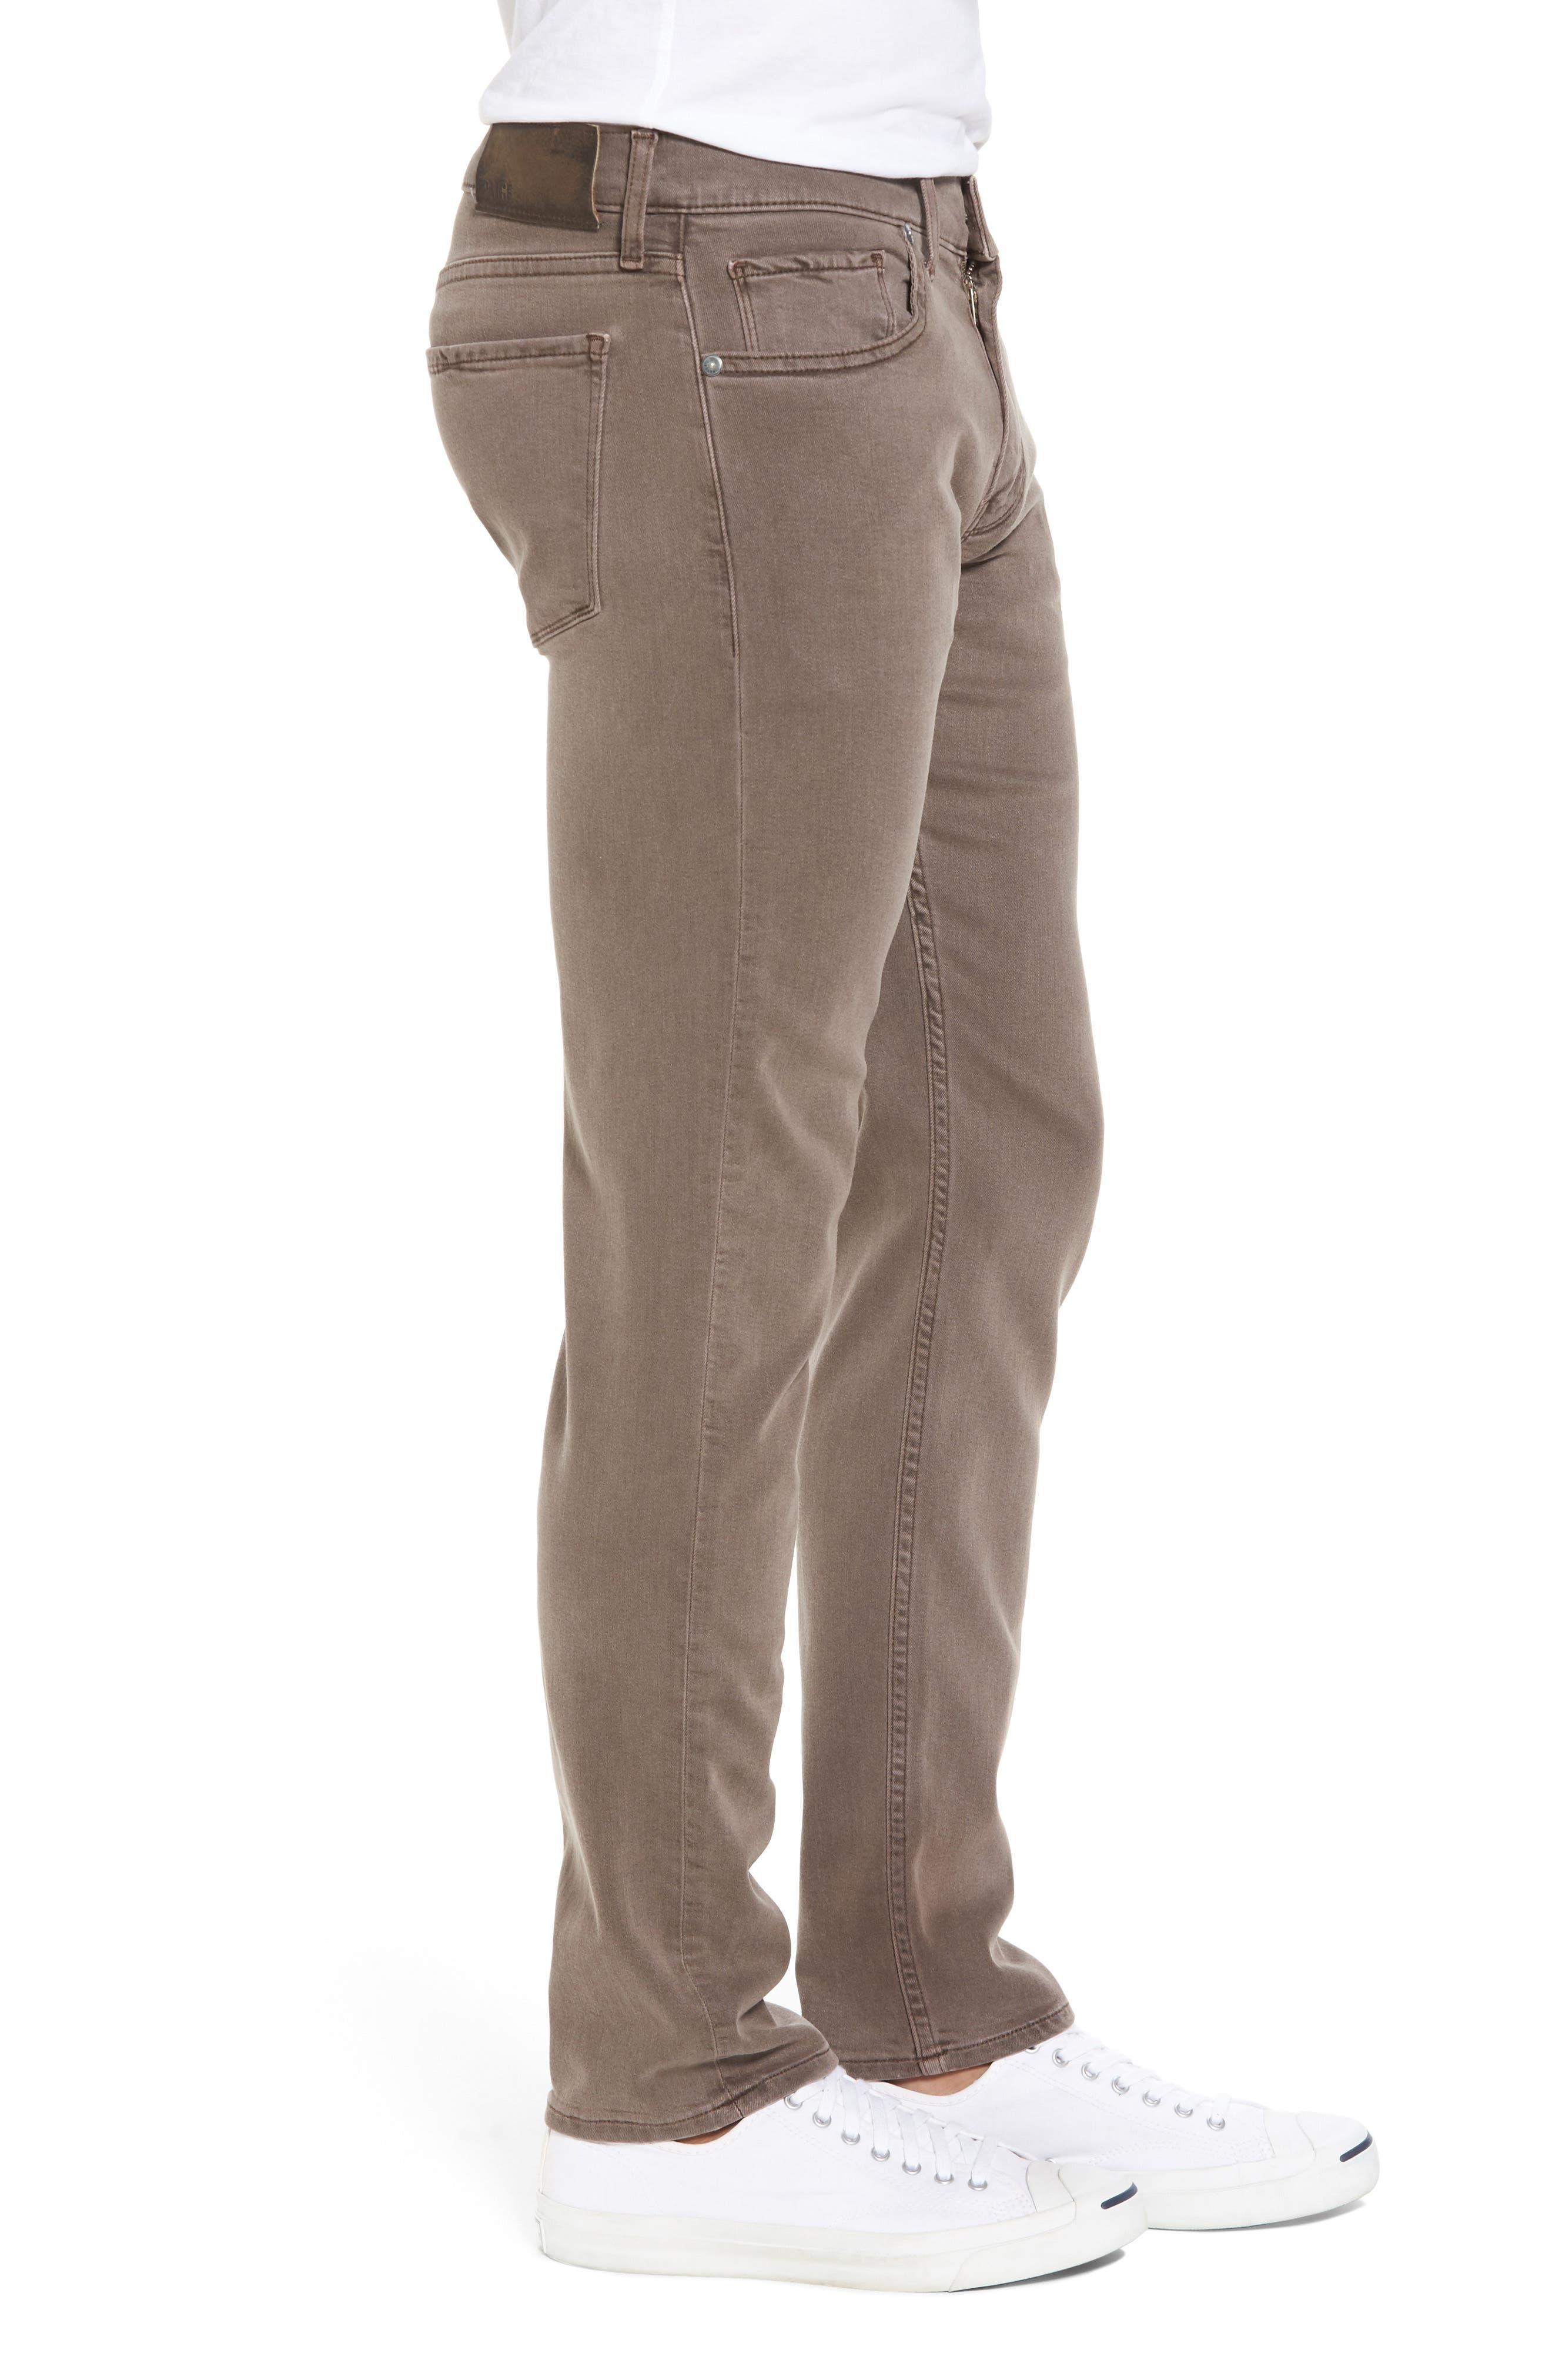 Transcend - Lennox Slim Fit Jeans,                             Alternate thumbnail 3, color,                             VINTAGE SAND BAR